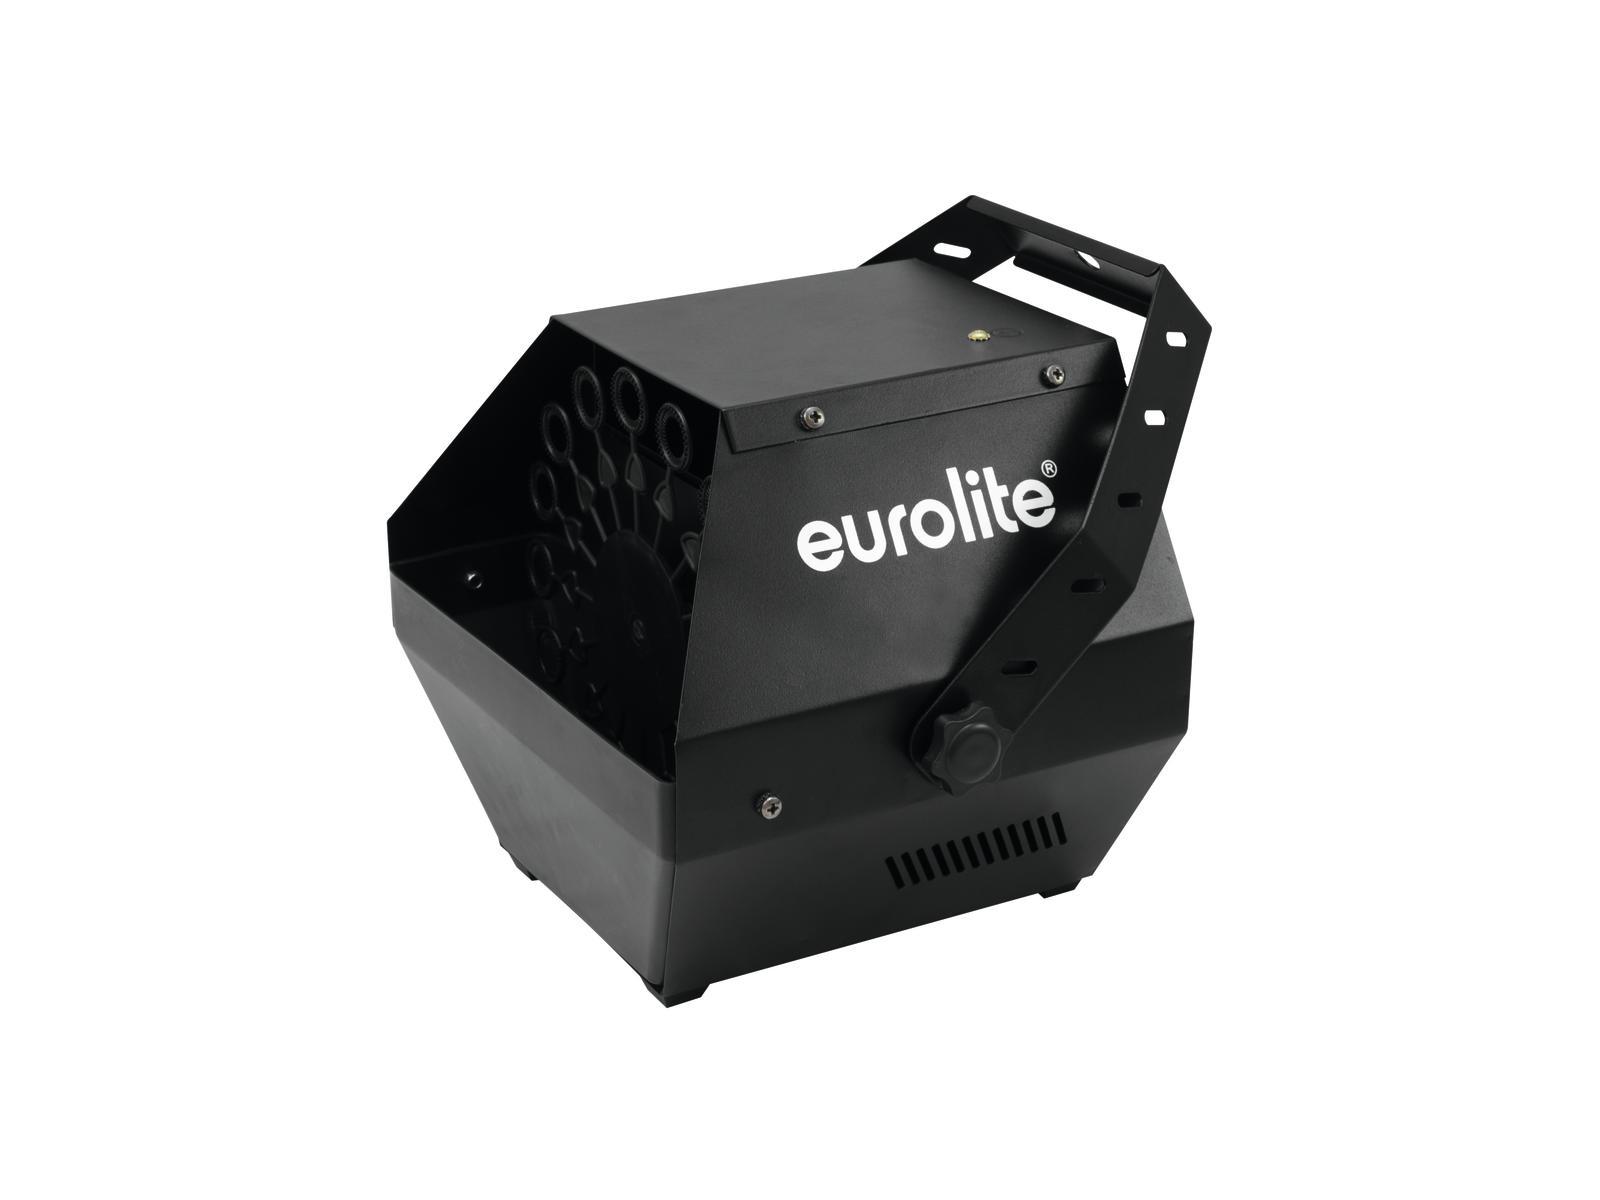 EUROLITE B-90 Seifenblasenmaschine schwarz